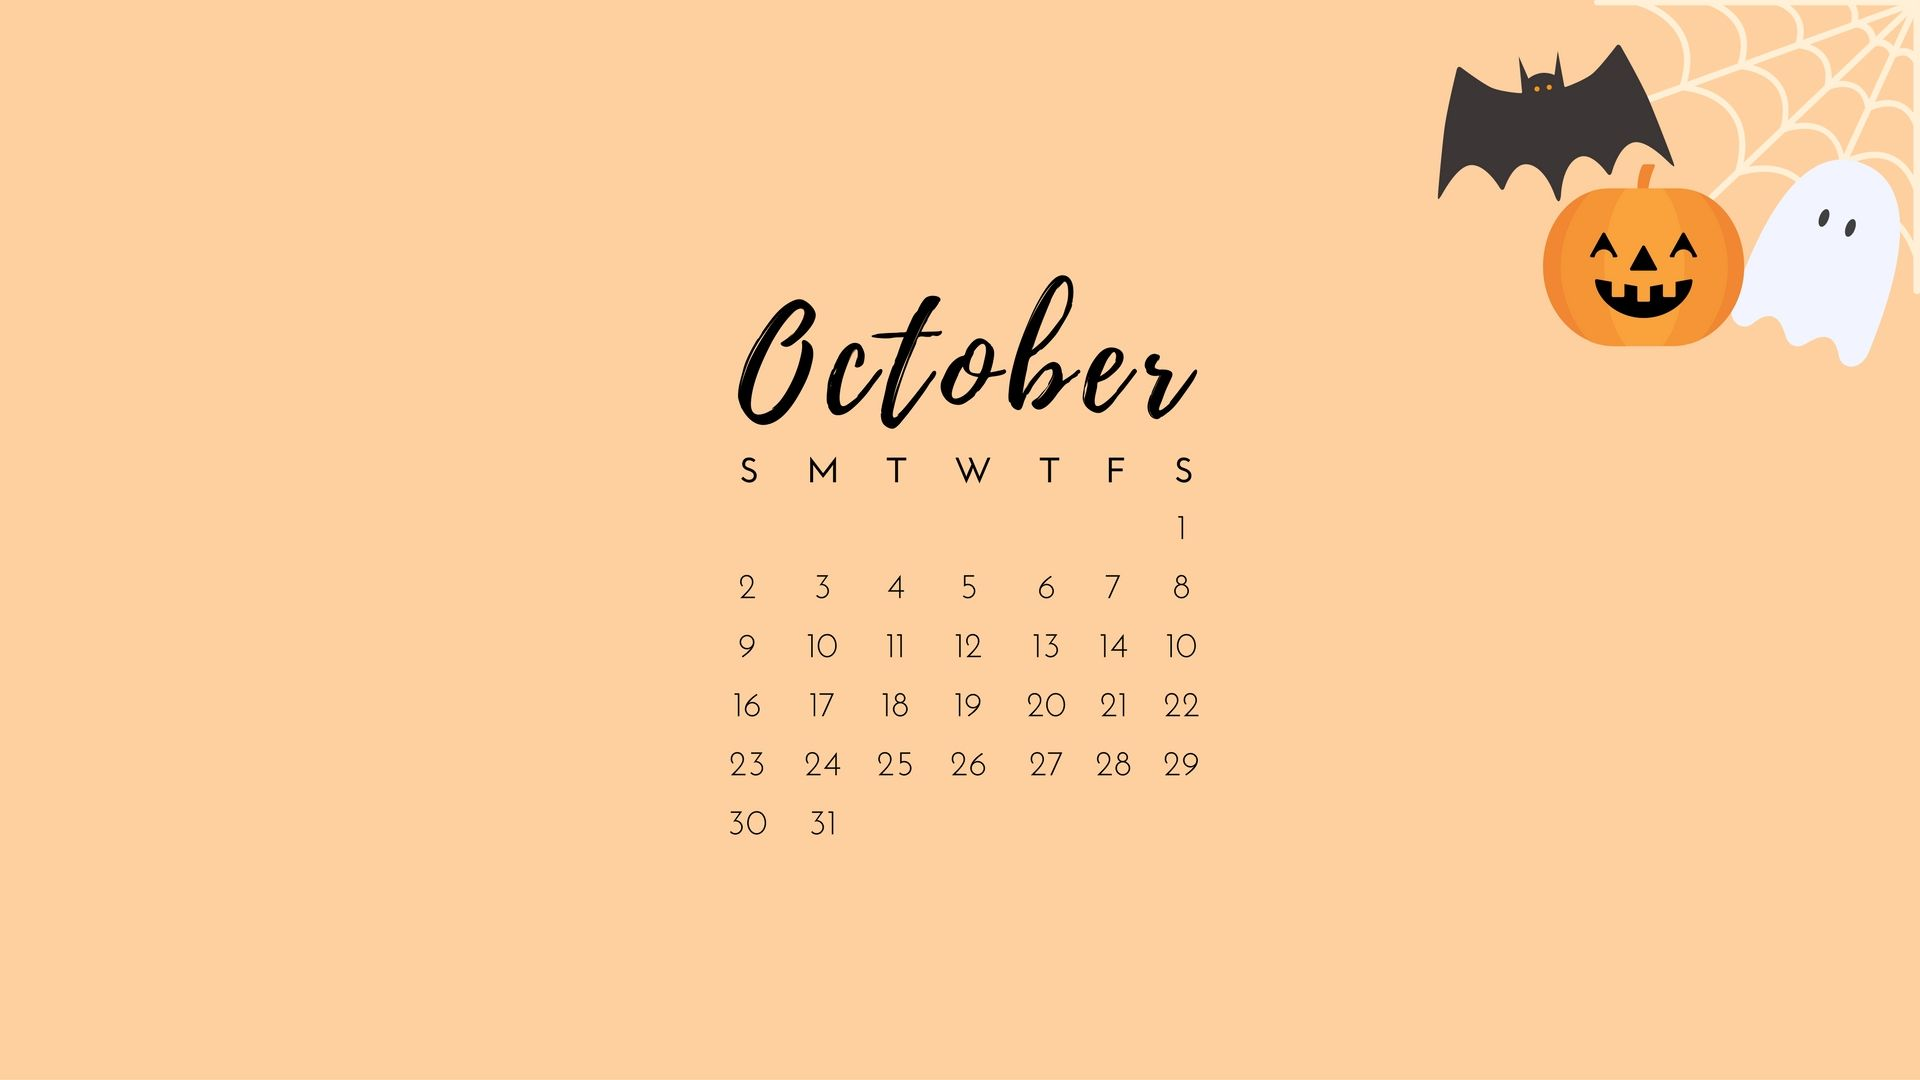 October 2016 Calendar Desktop Wallpaper Desktop Wallpaper Calendar Halloween Desktop Wallpaper Desktop Wallpaper